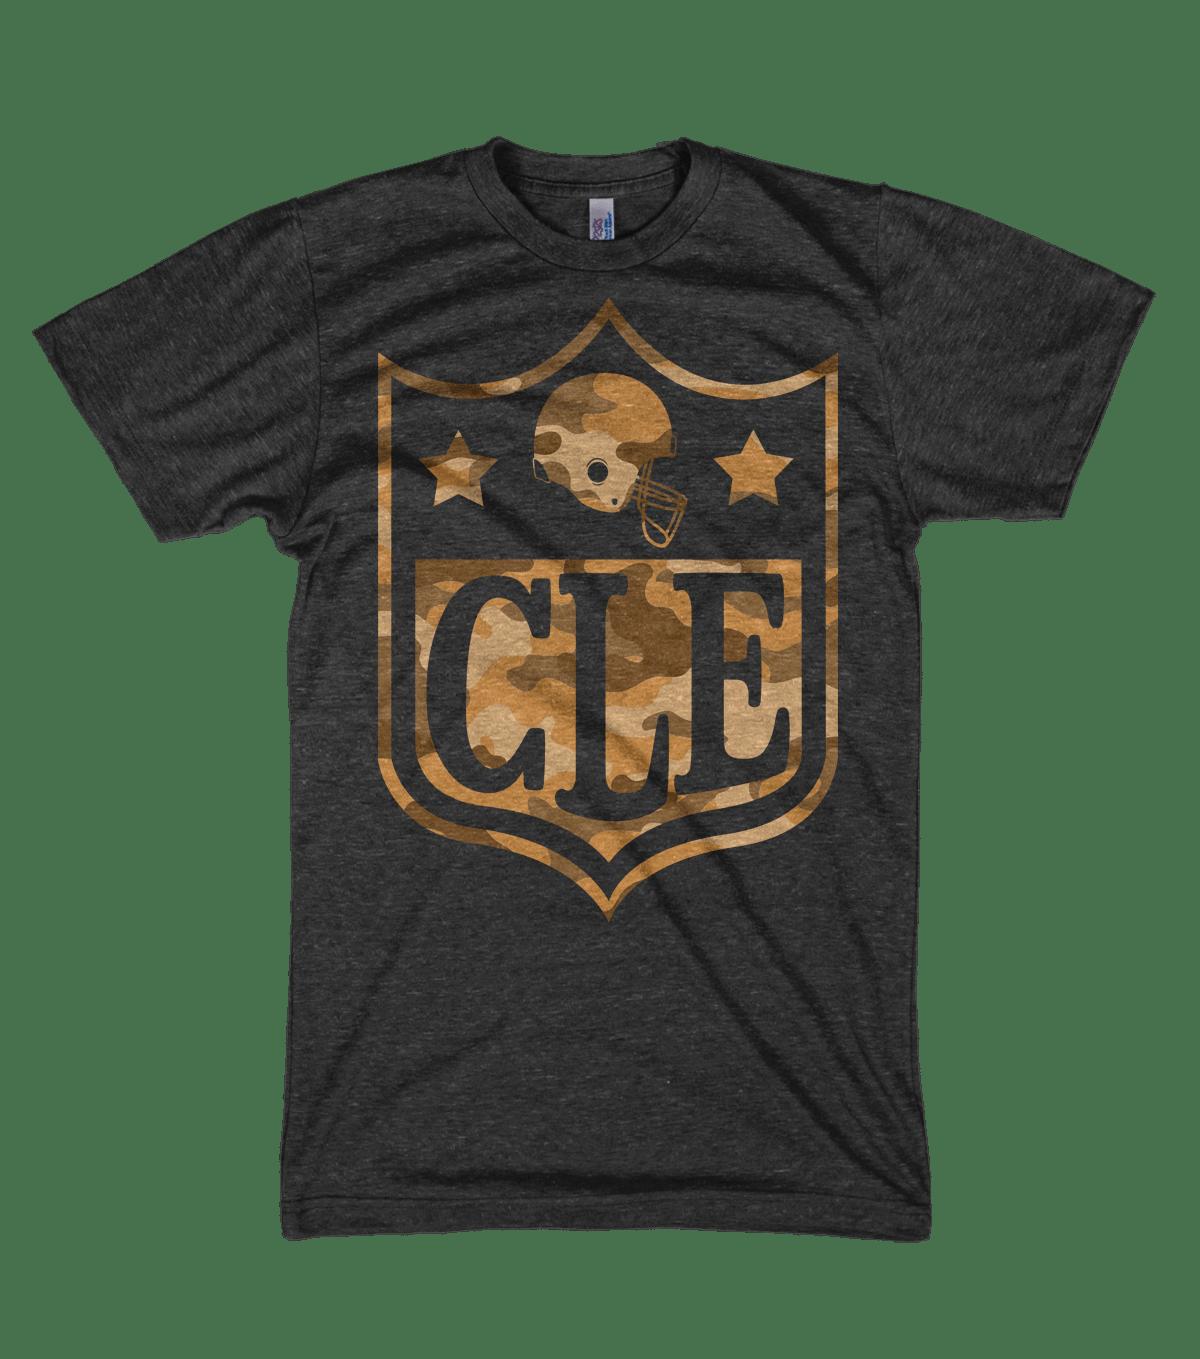 Image of CLE NFL Camo Black Shirt